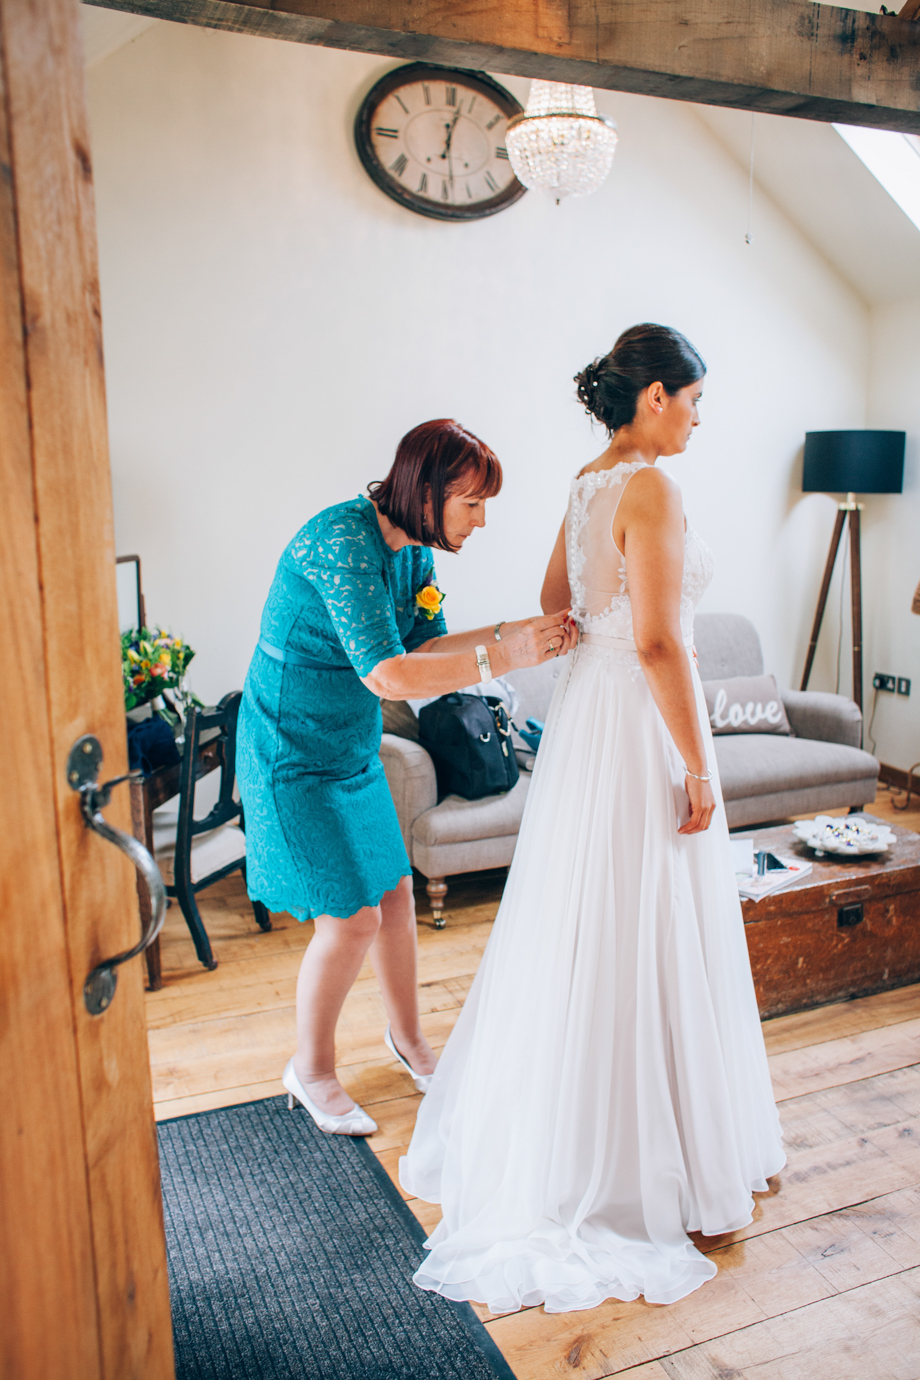 Tythe-Barn-Bicester-Wedding-14